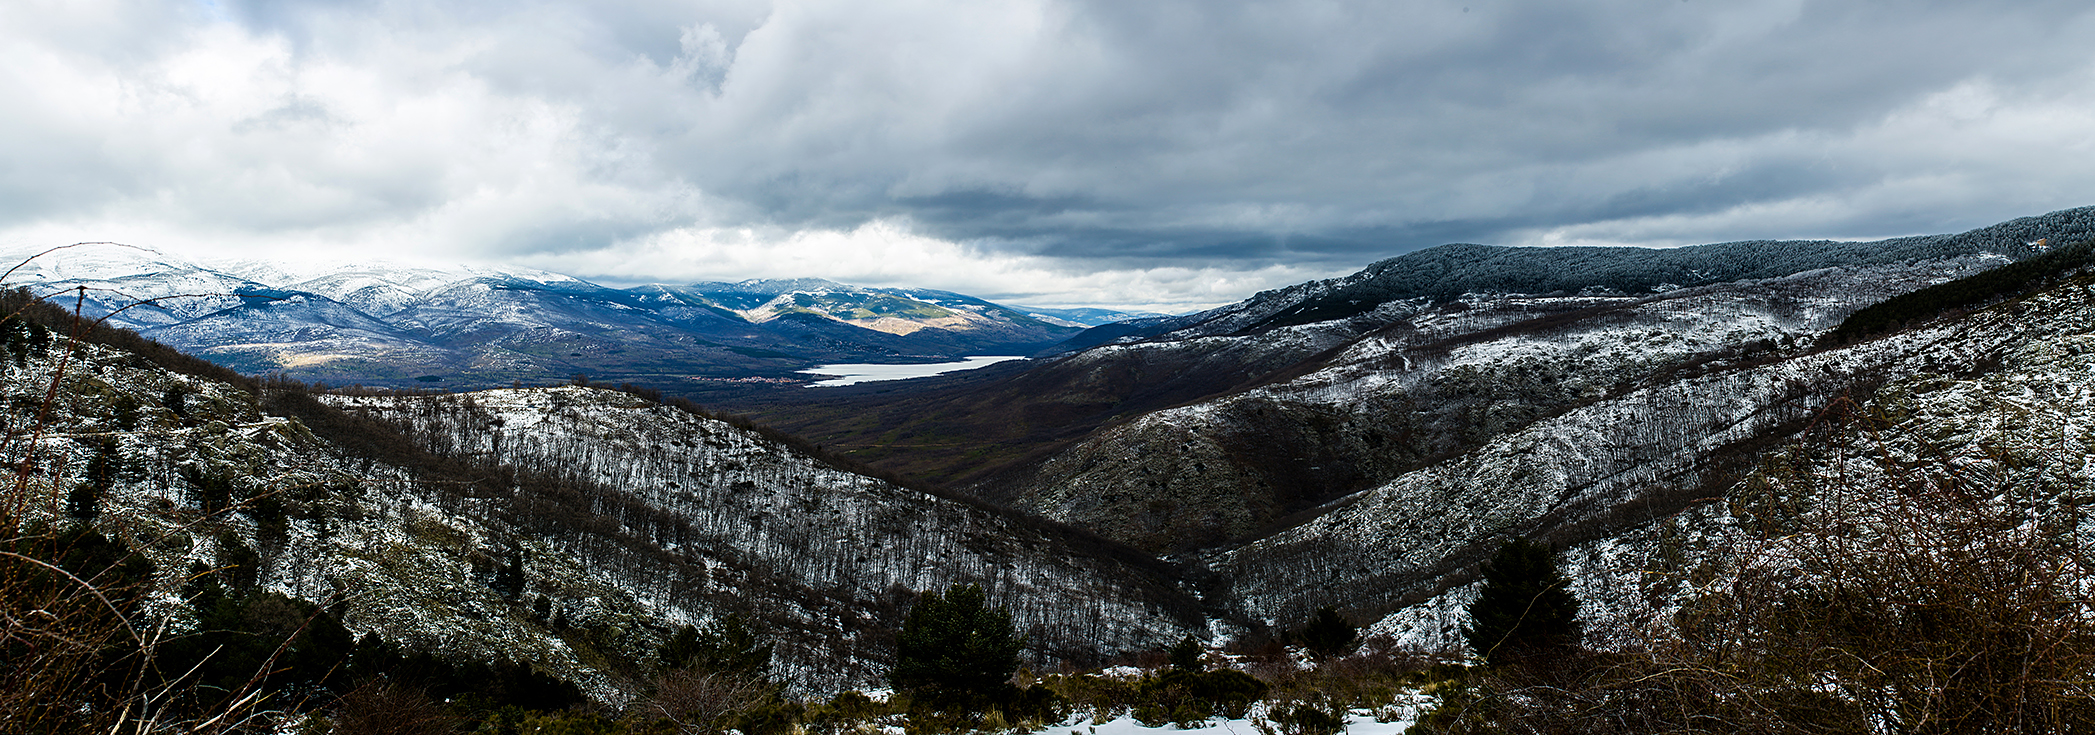 MLM 2016_Pano valle de Lozoya-1 Panorama Baja.jpg